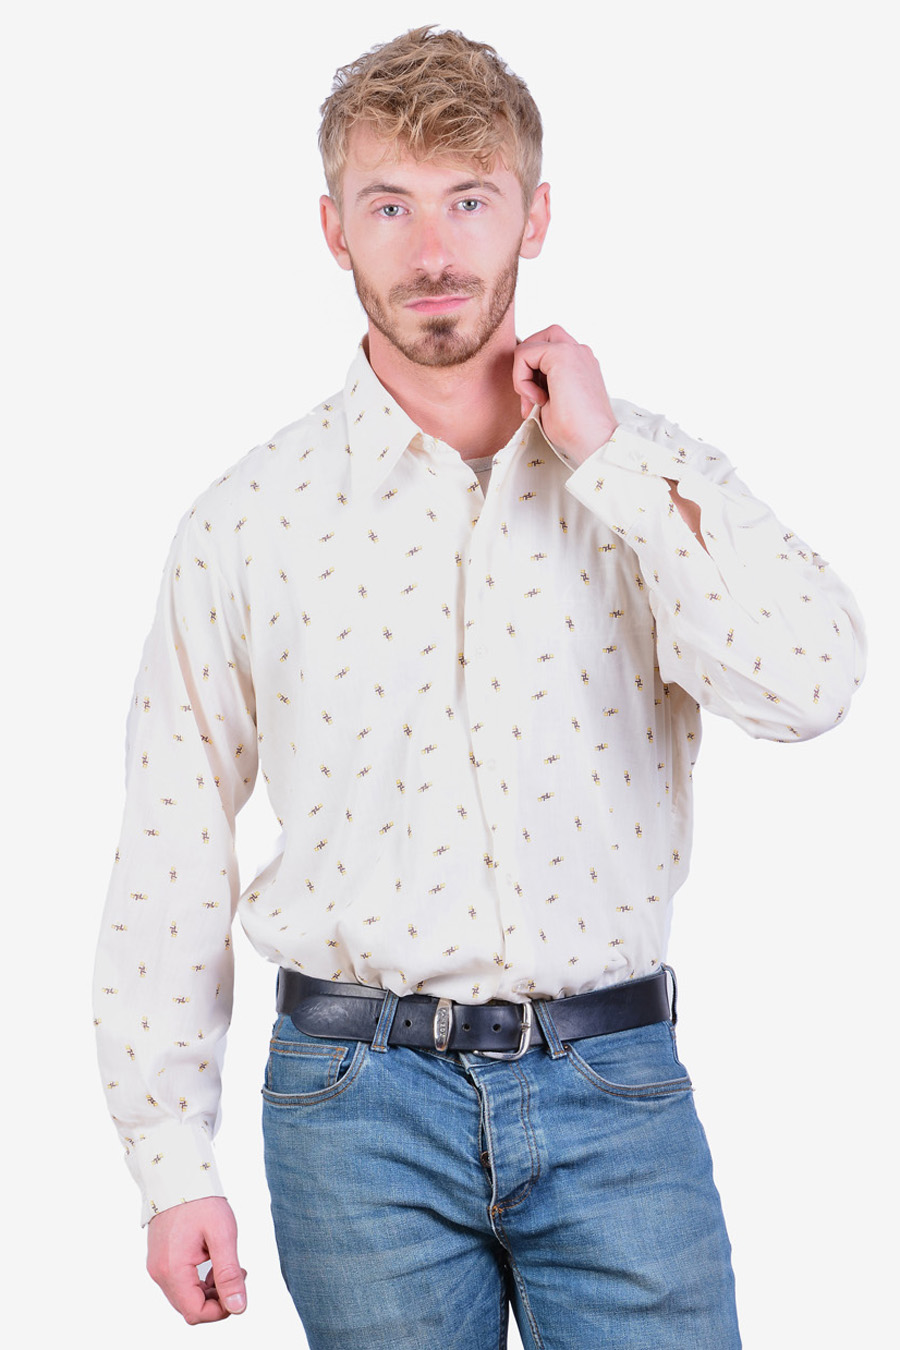 Vintage 1970's shirt